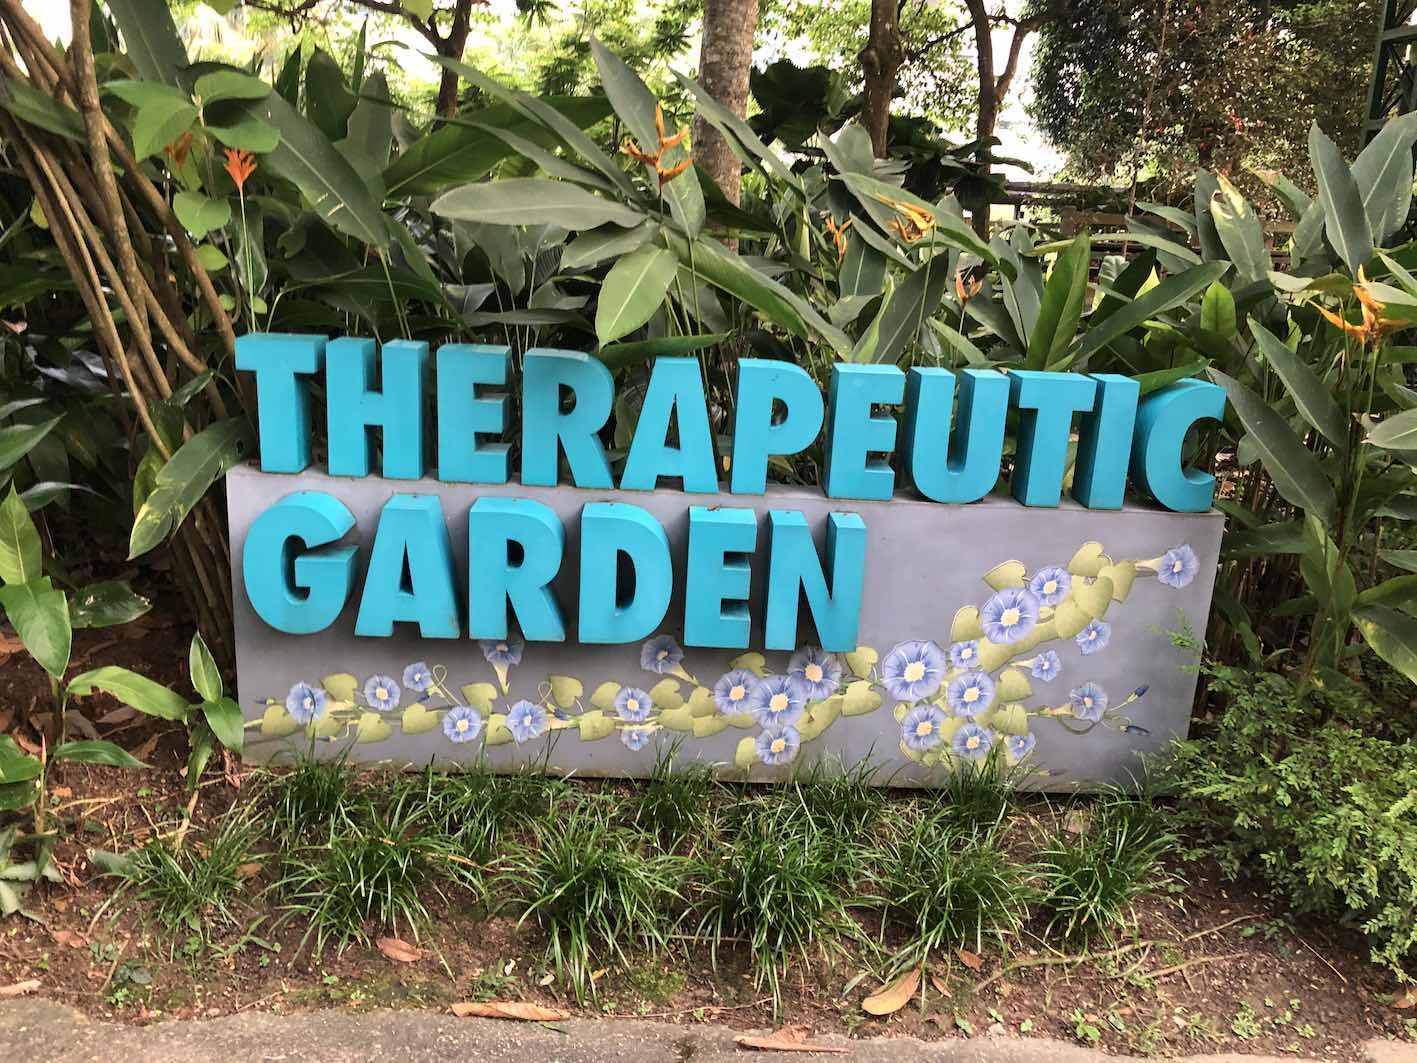 Therapeutic garden